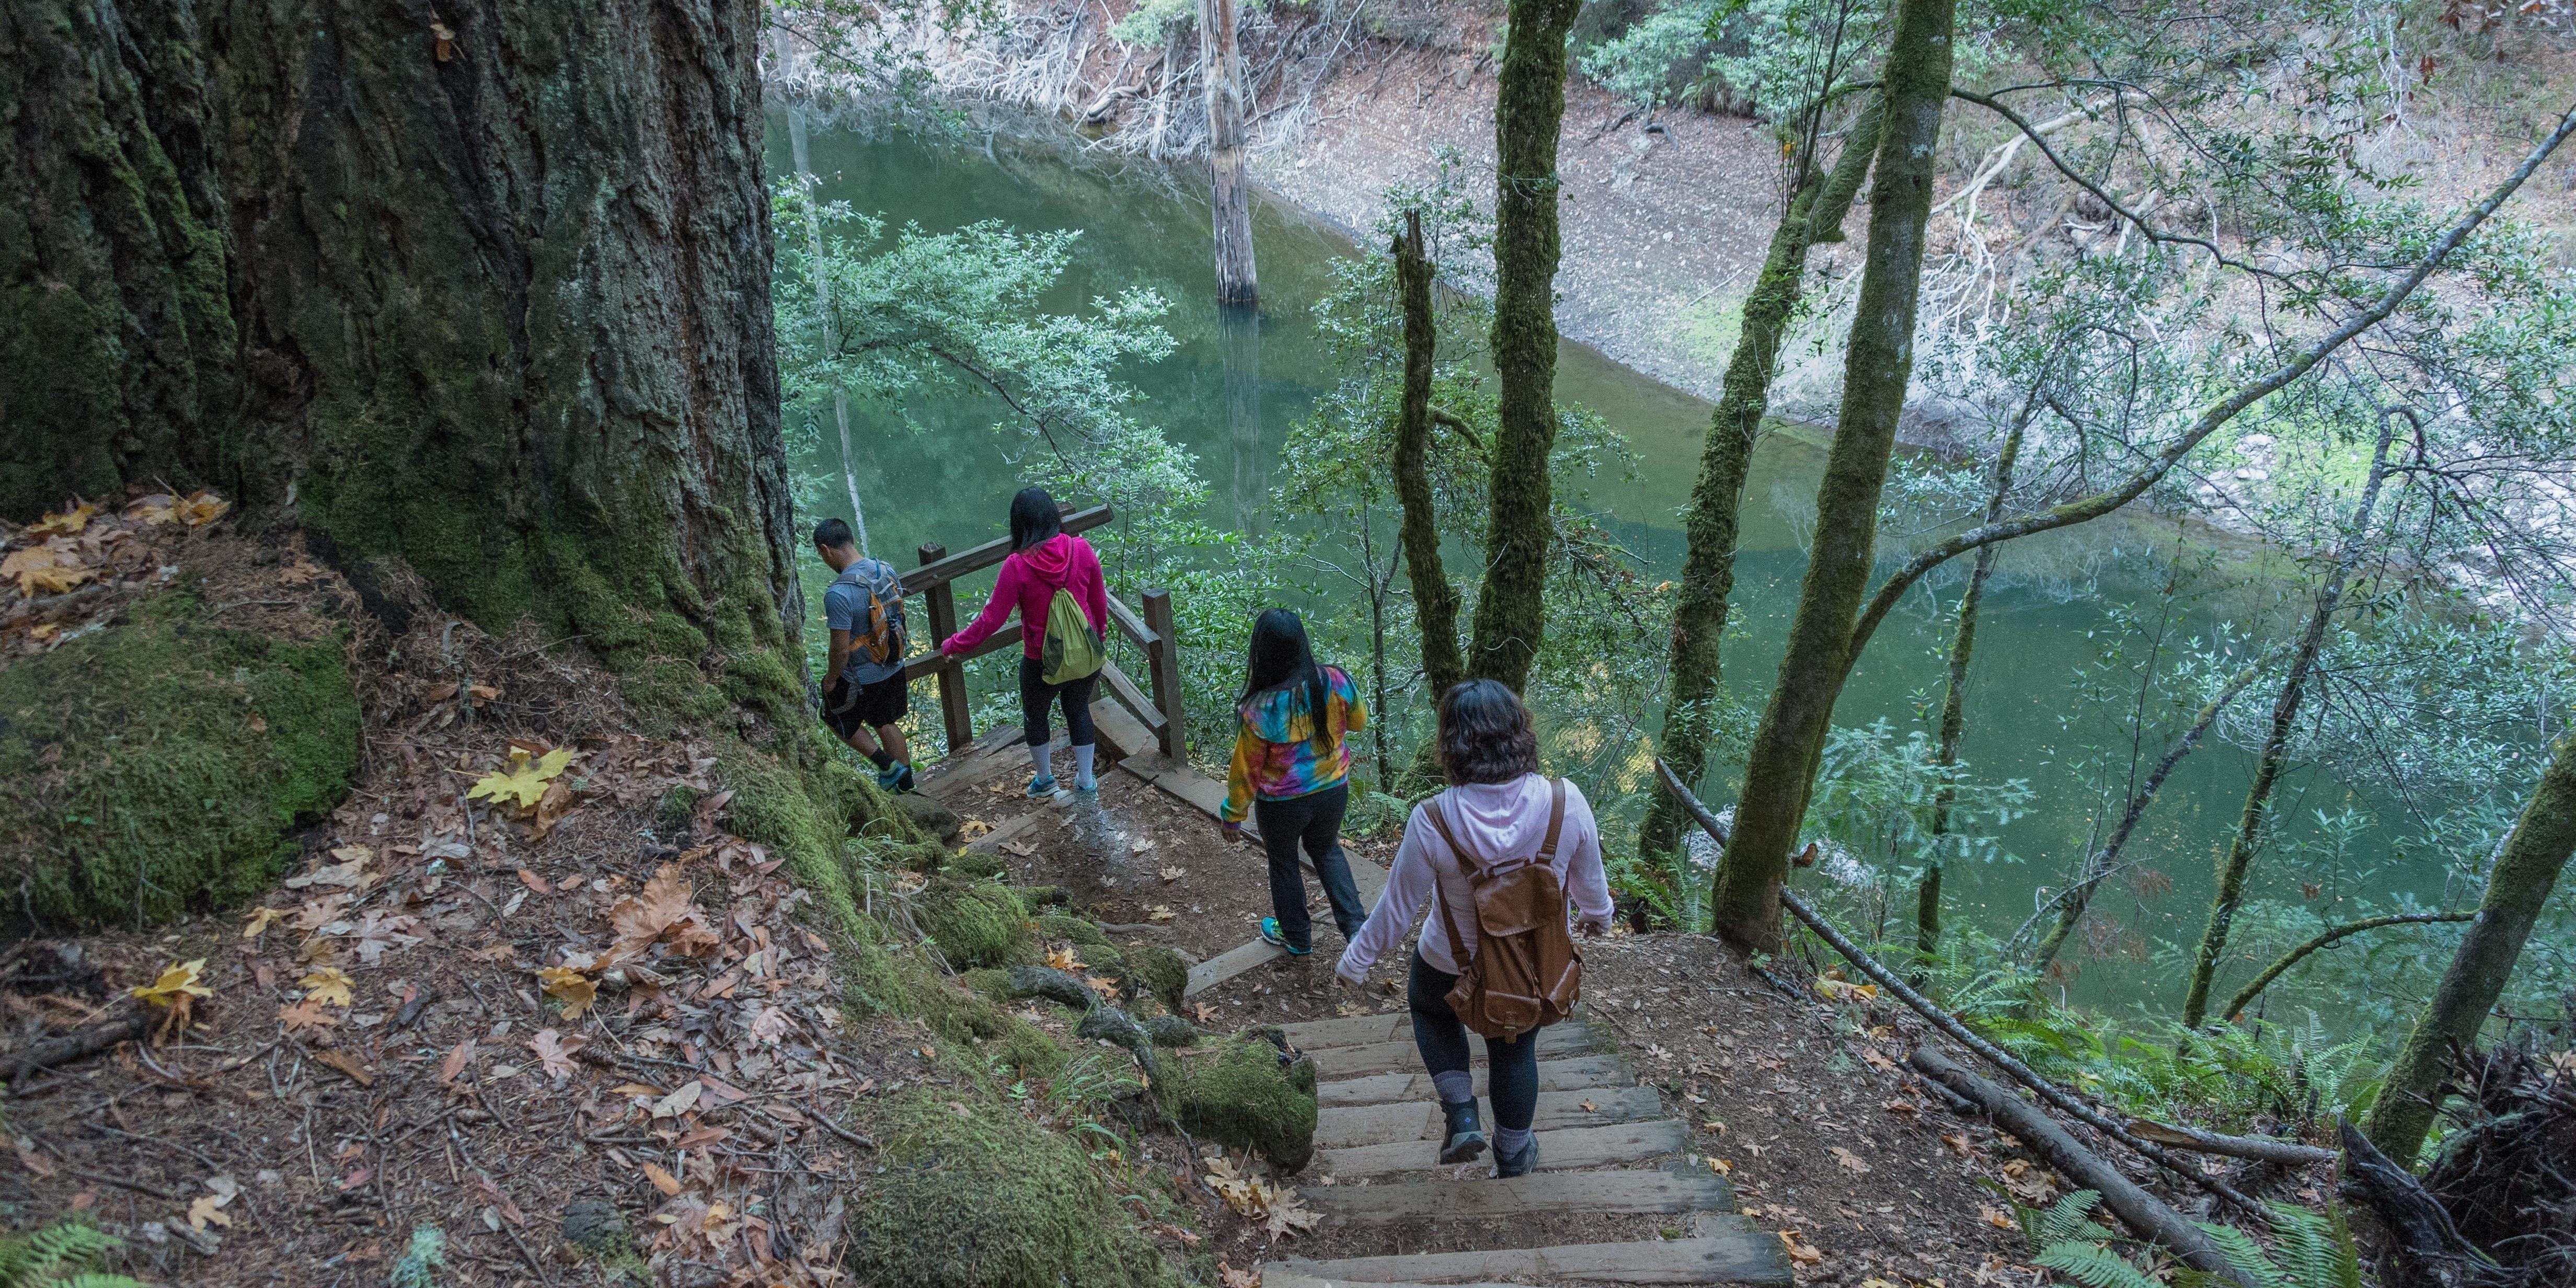 Visitors explore the Cataract Trail